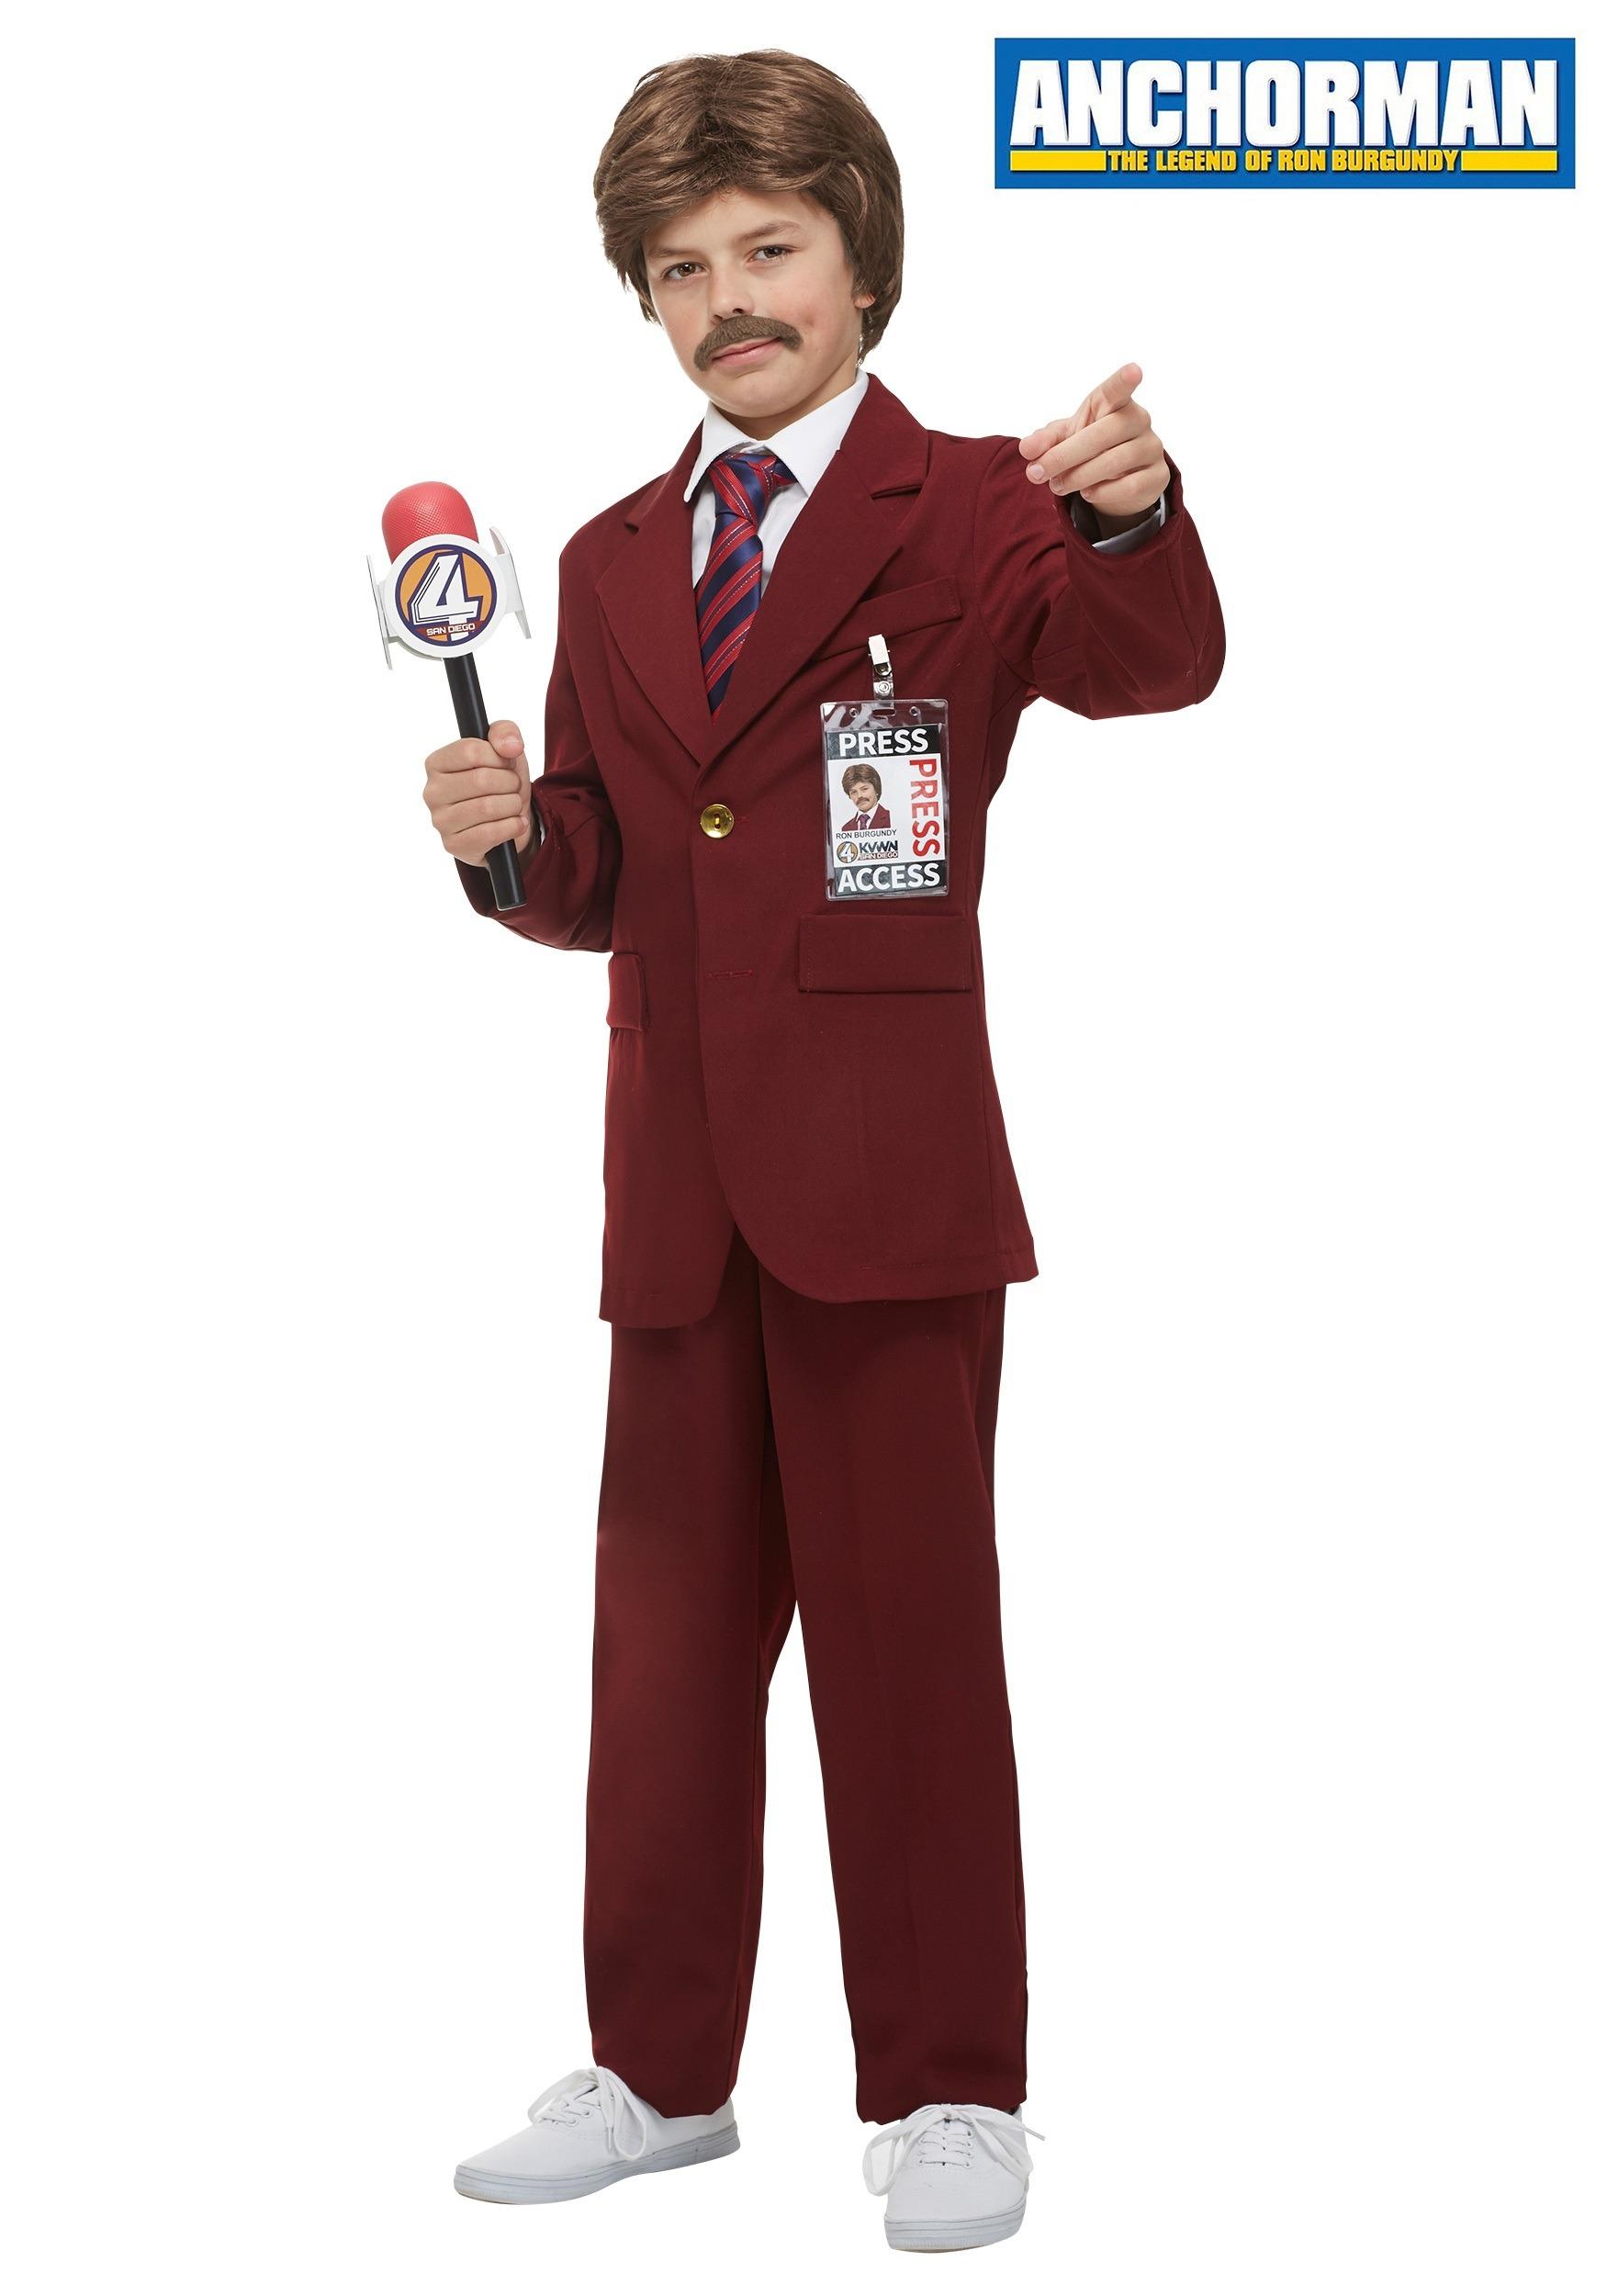 Anchorman Child Ron Burgundy Costume FUN2275CH